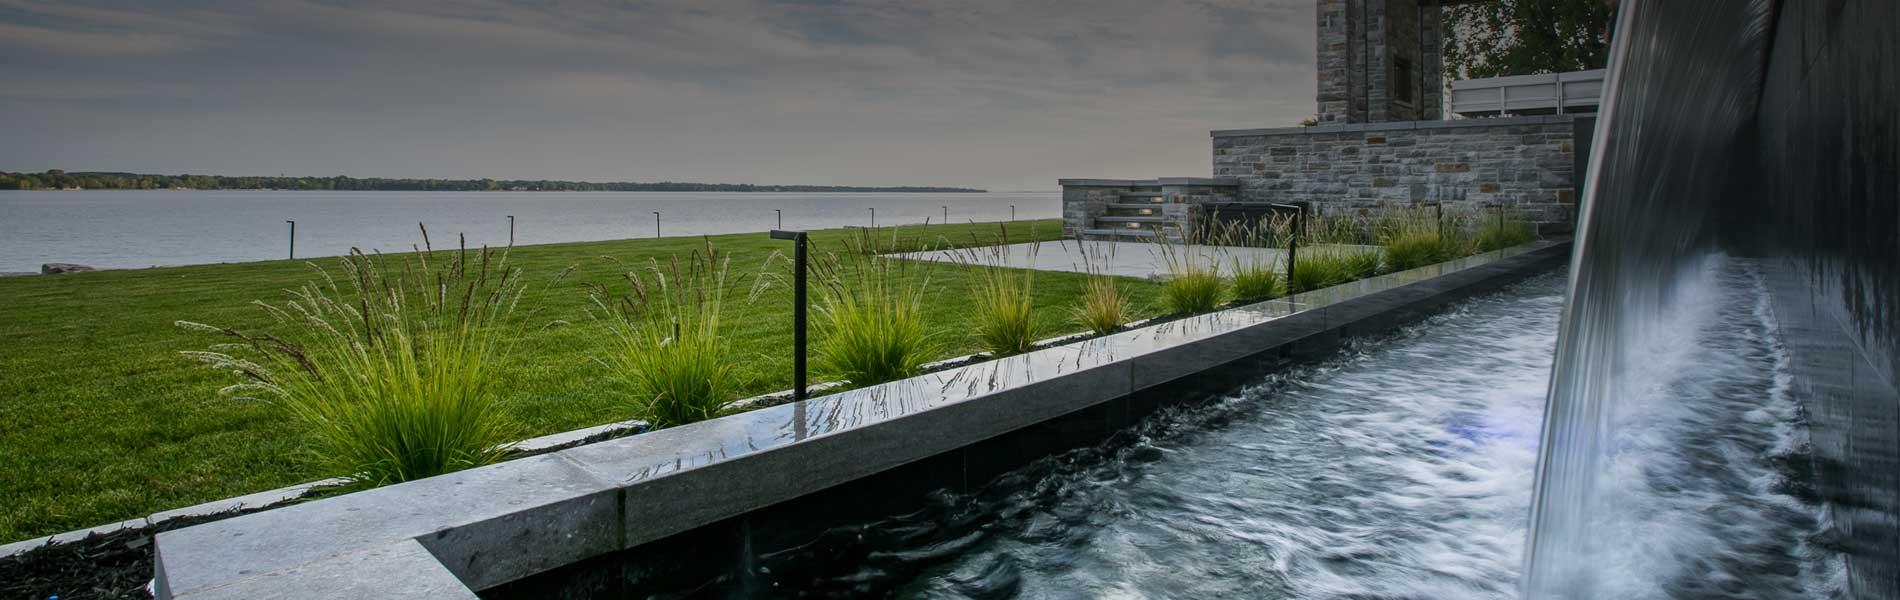 Chute bassin paysagement PDA design